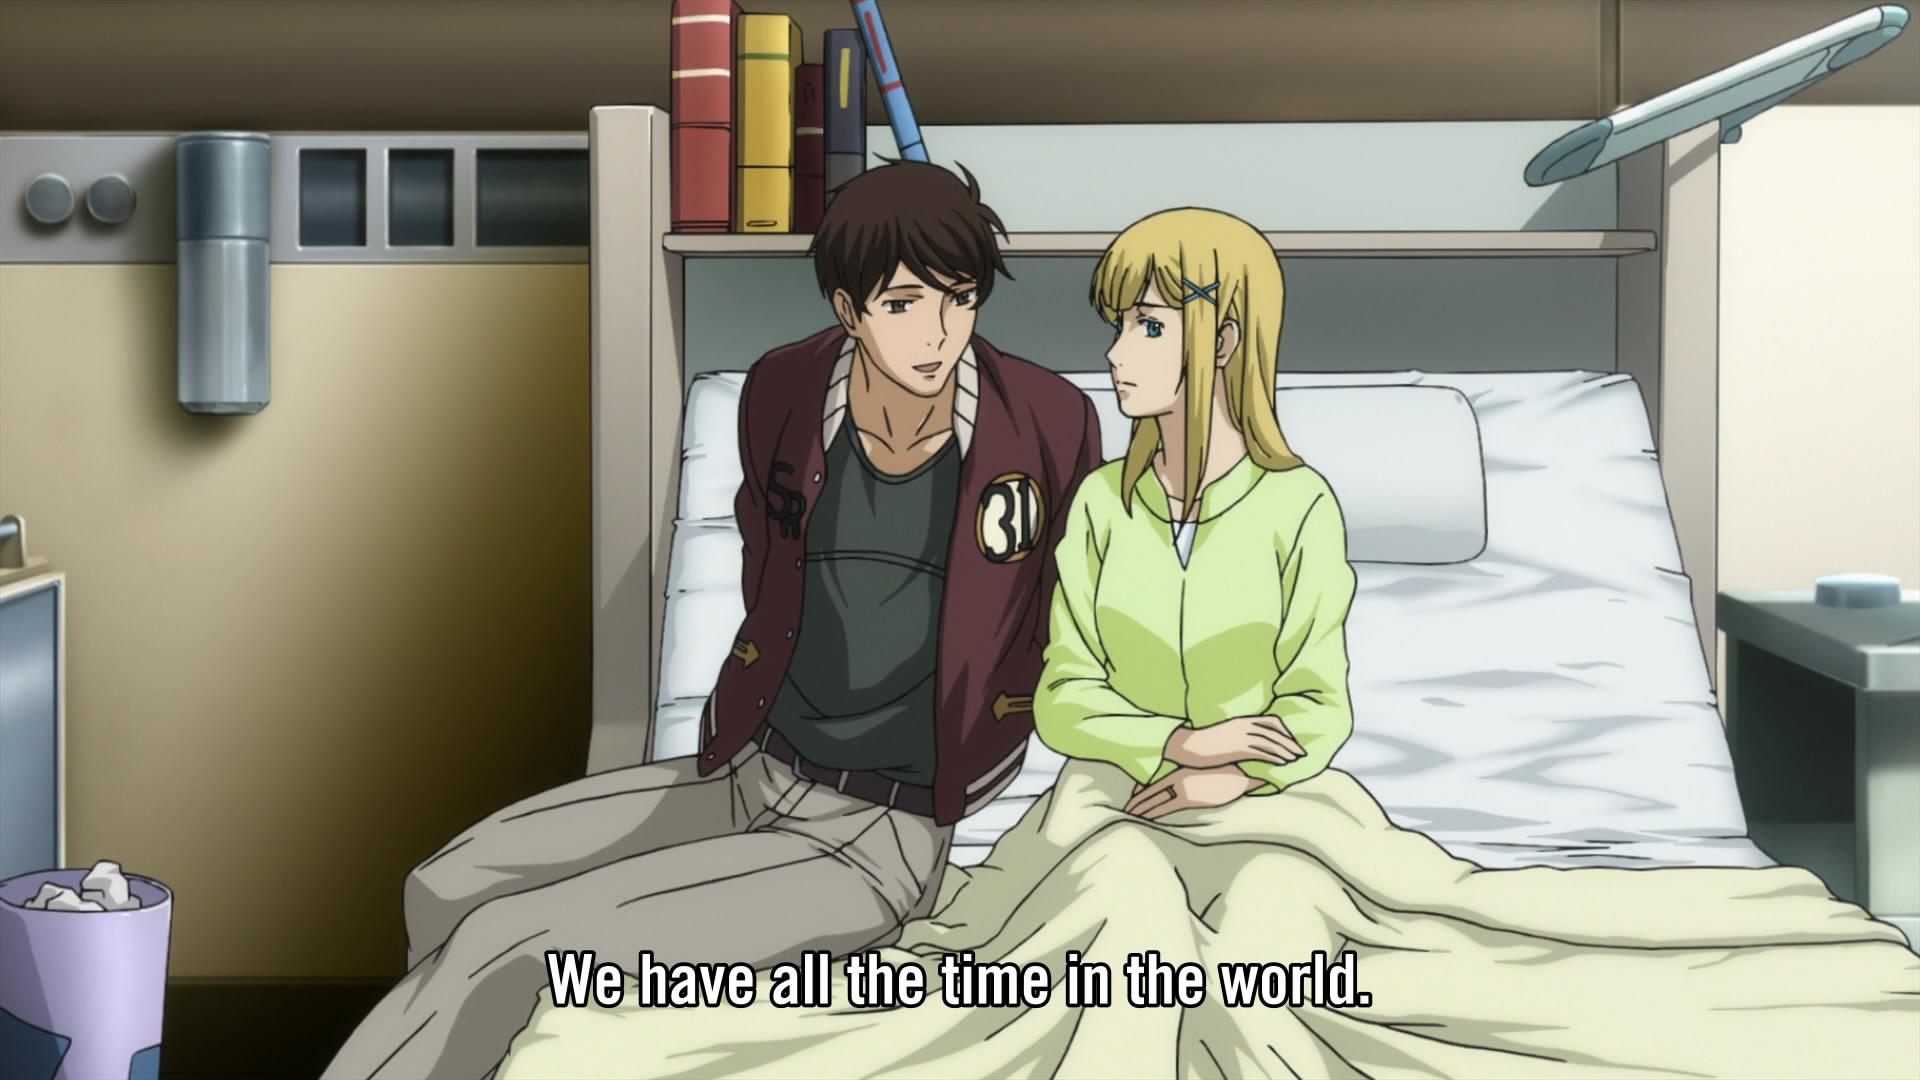 [gSS]_Mobile_Suit_Gundam_00_-_A_wakening_of_the_Trailblazer_(1080p)_[2B252856].mkv_snapshot_00.09.01_[2011.01.07_04.04.38]